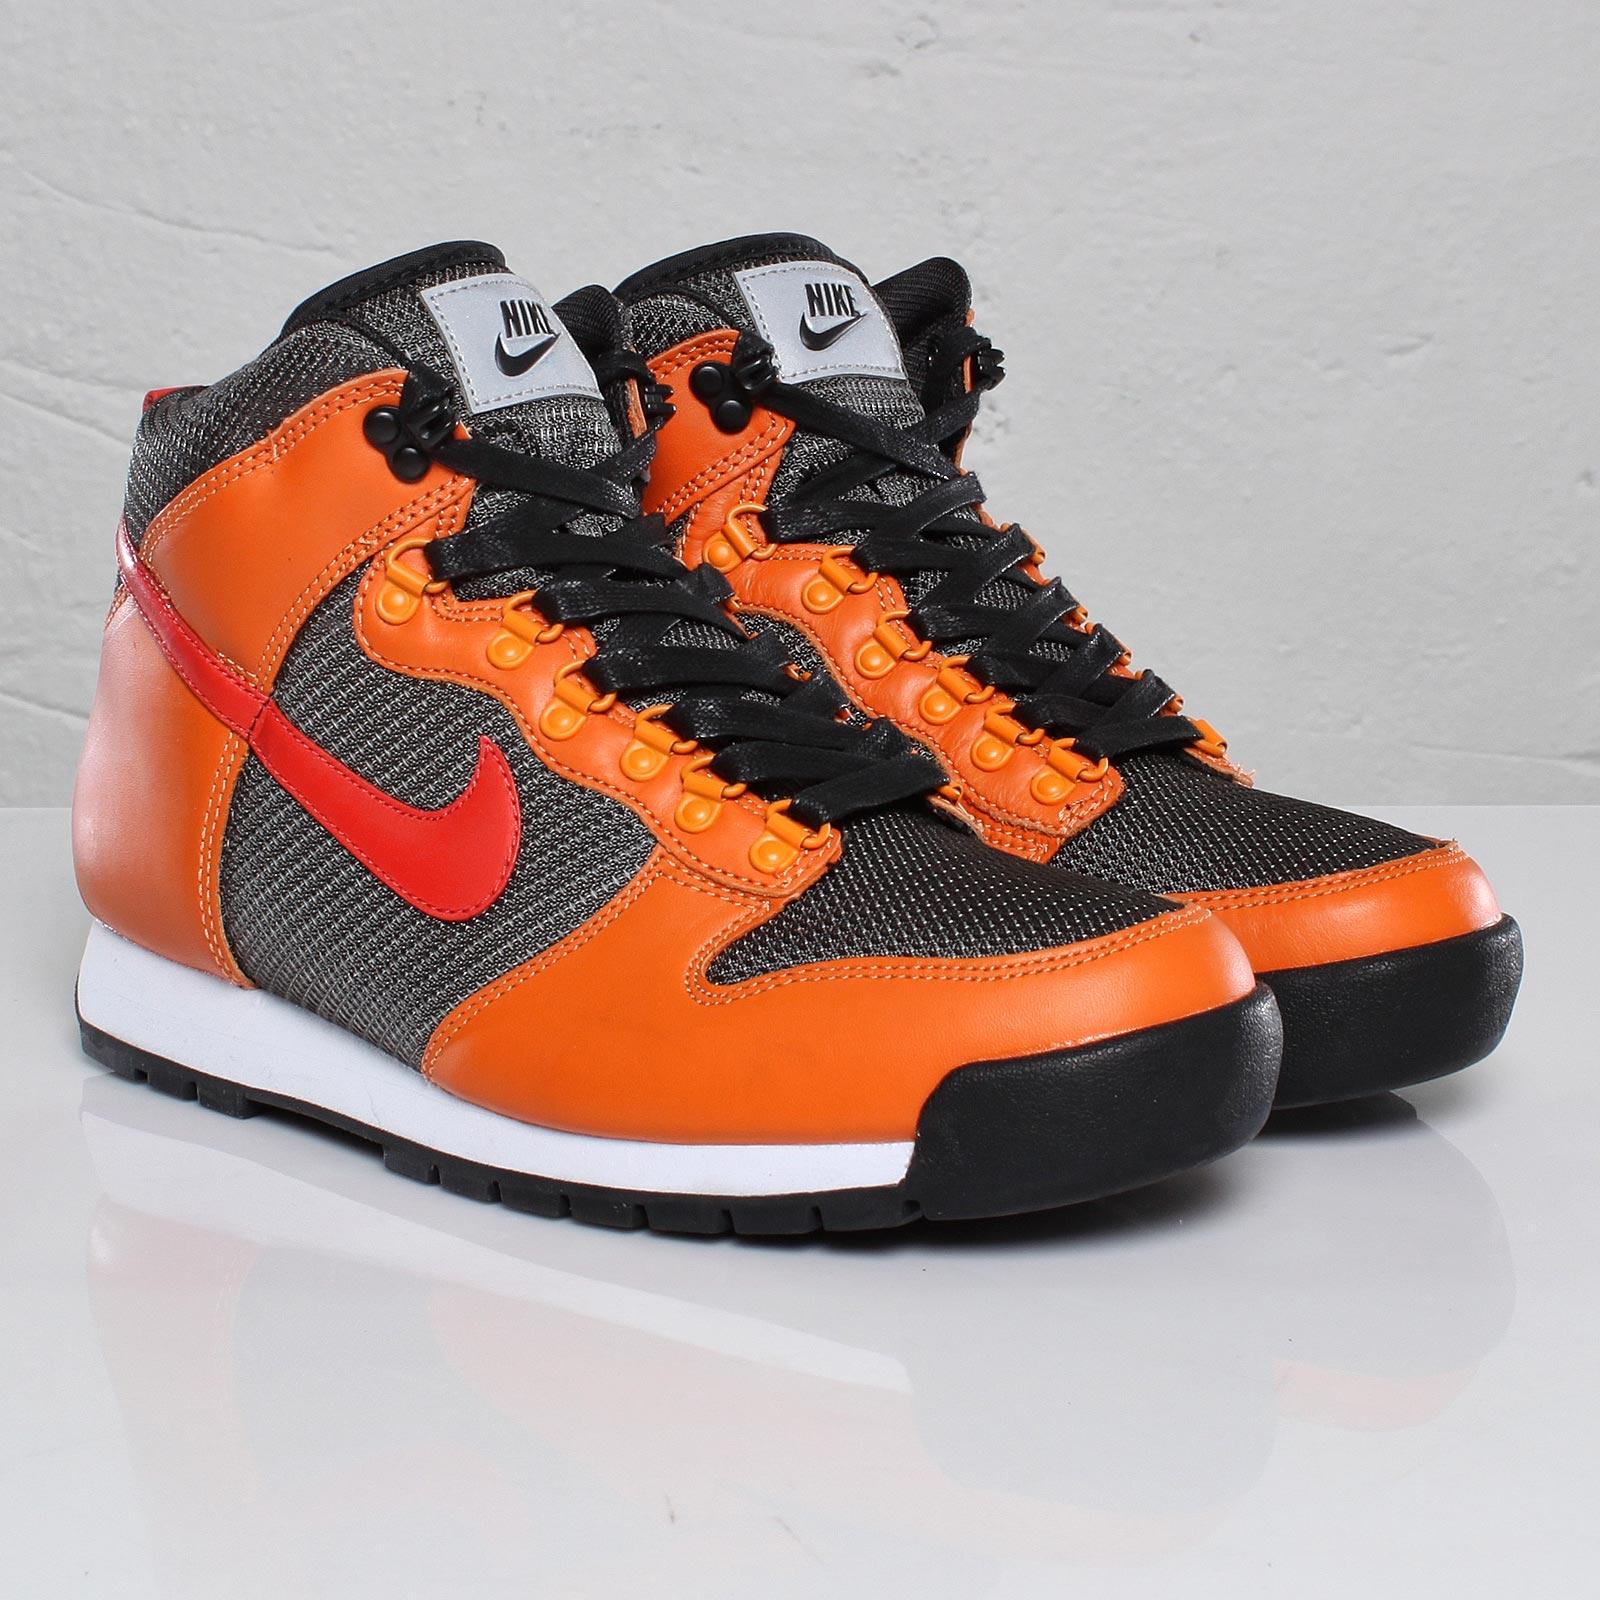 Nike Lava Dunk High Premium - 102023